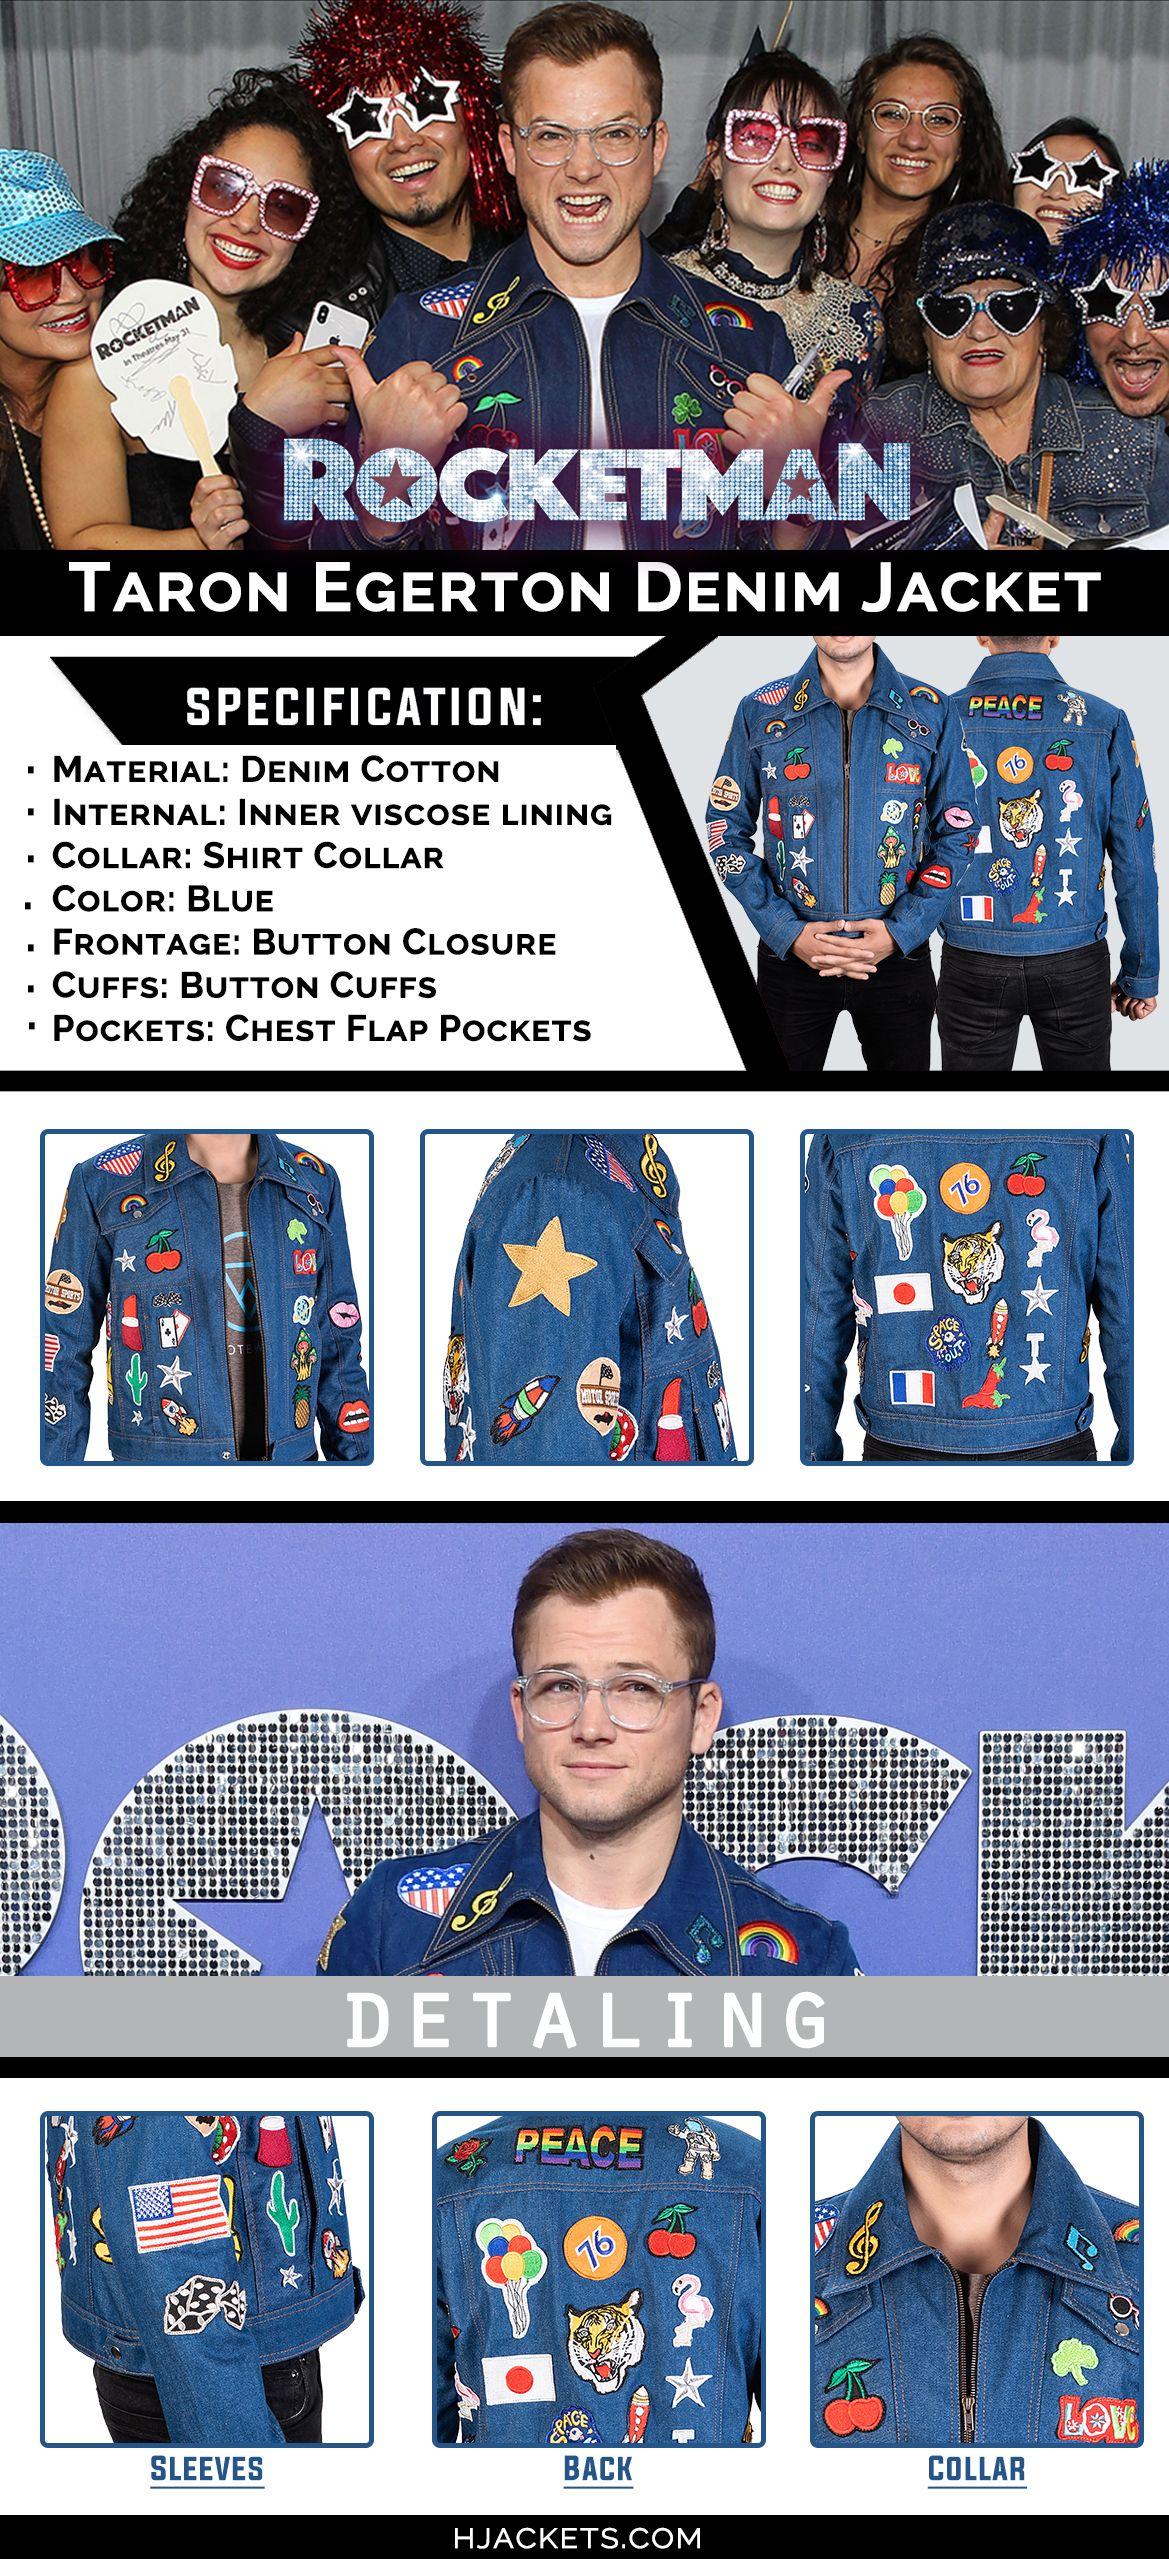 Rocketman Denim Jacket Infographic Denim Jacket Patches Jackets Patches Jacket [ 2559 x 1169 Pixel ]